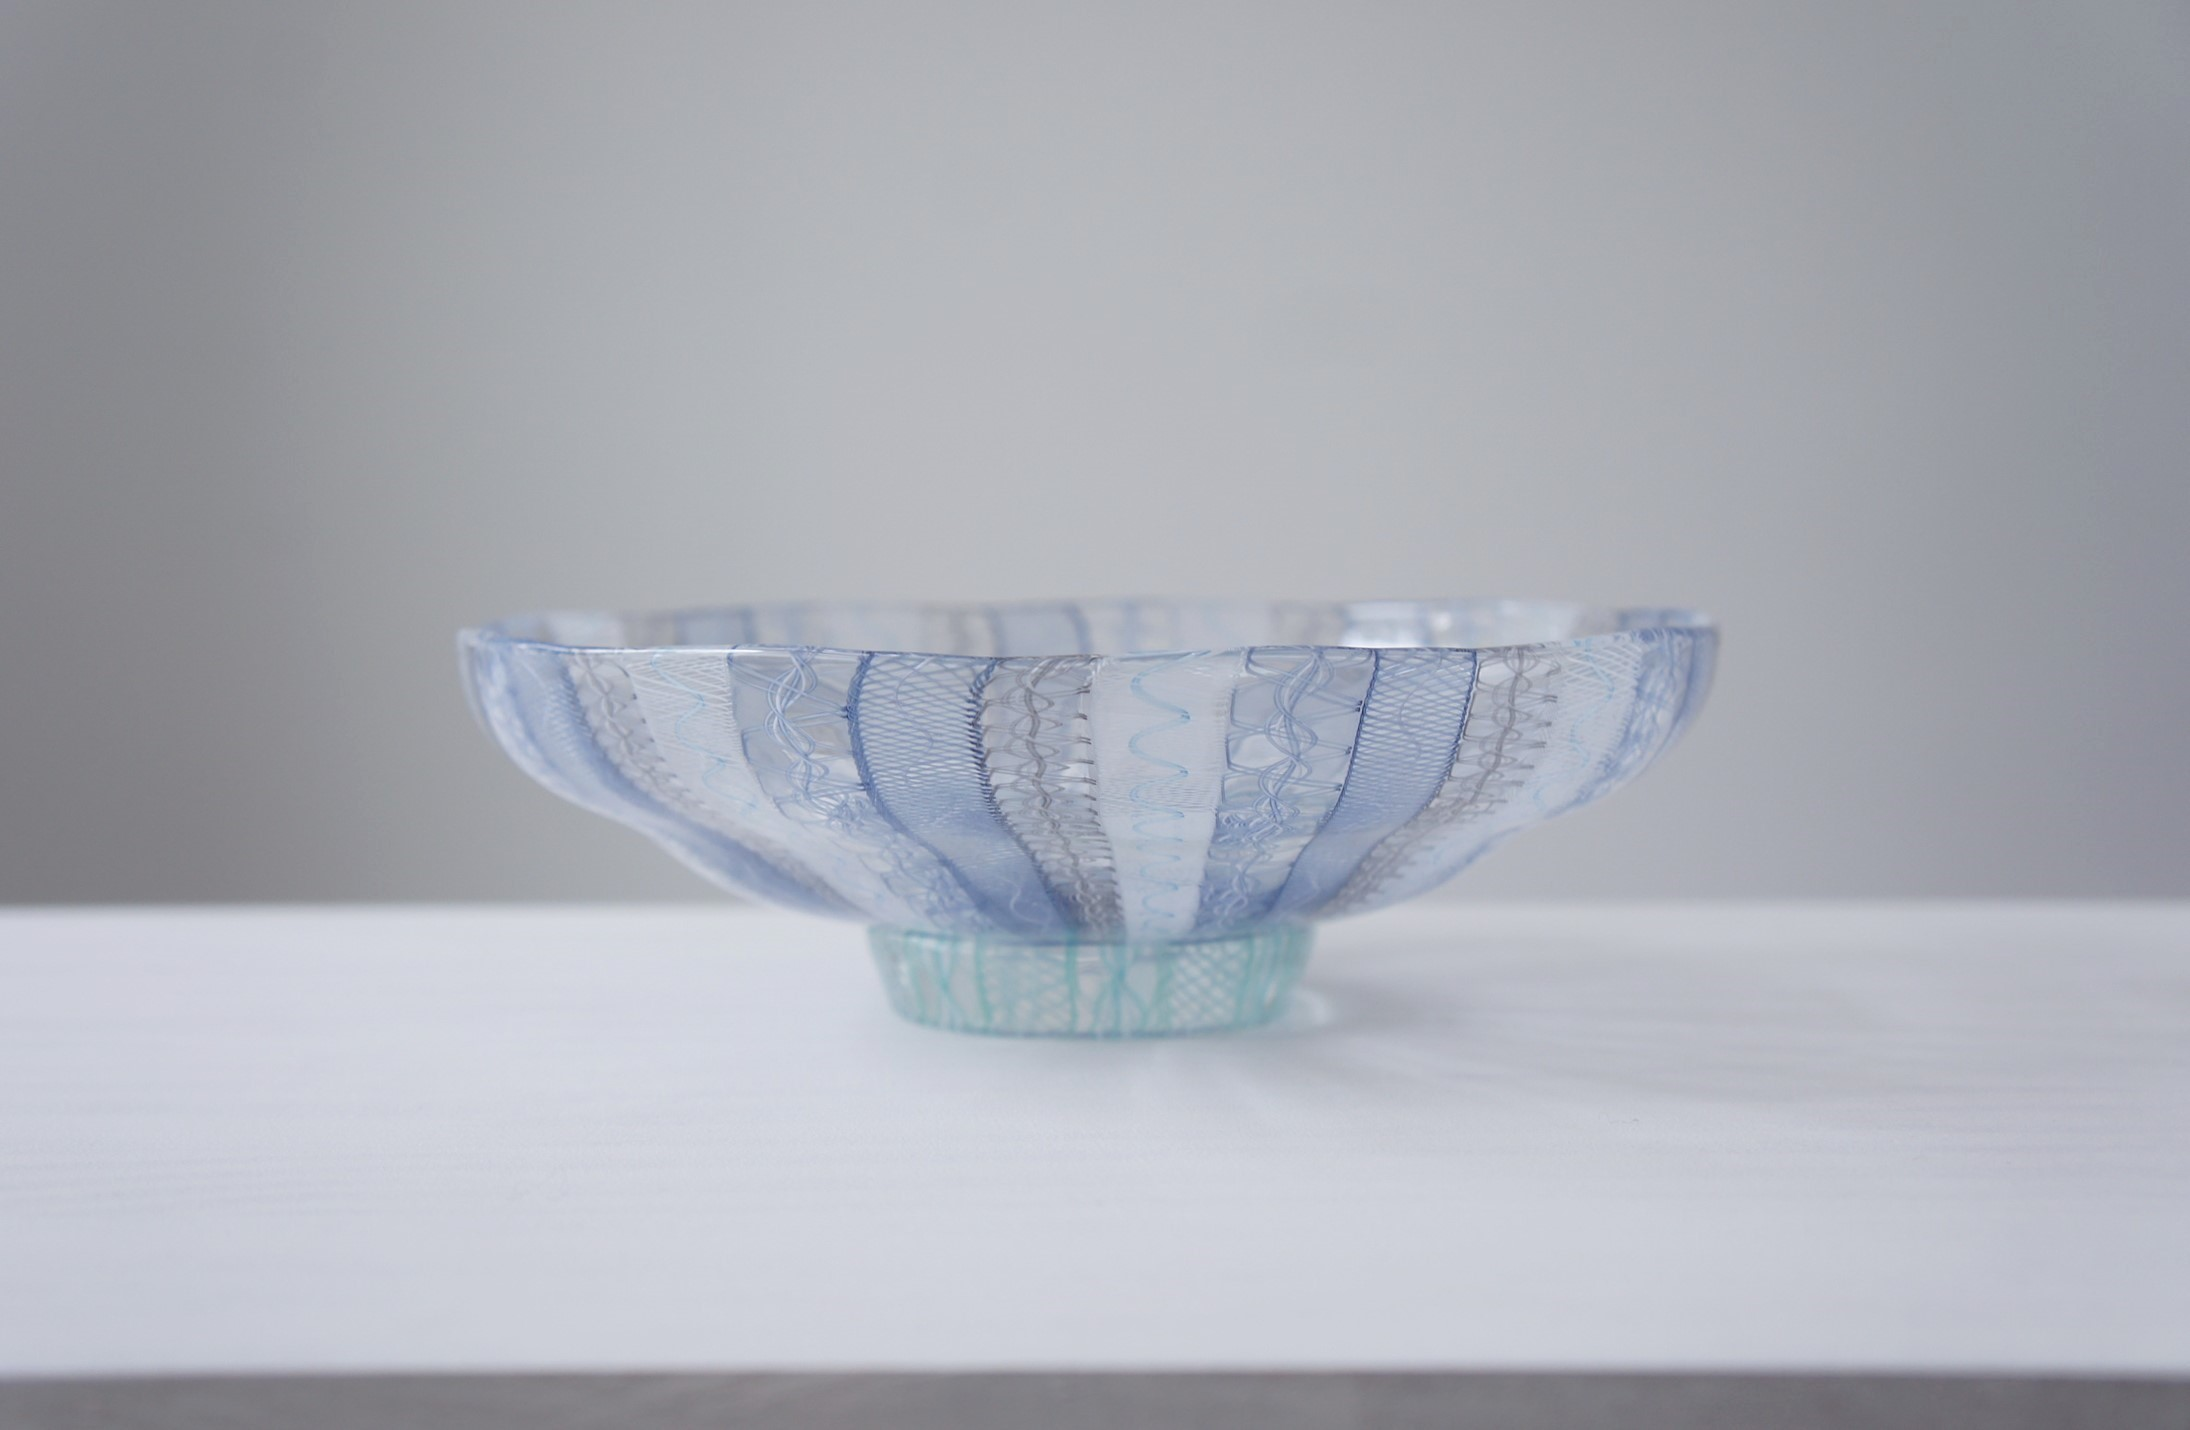 Luccichii展出品作品 小西潮さんの平茶碗_b0353974_22213797.jpg